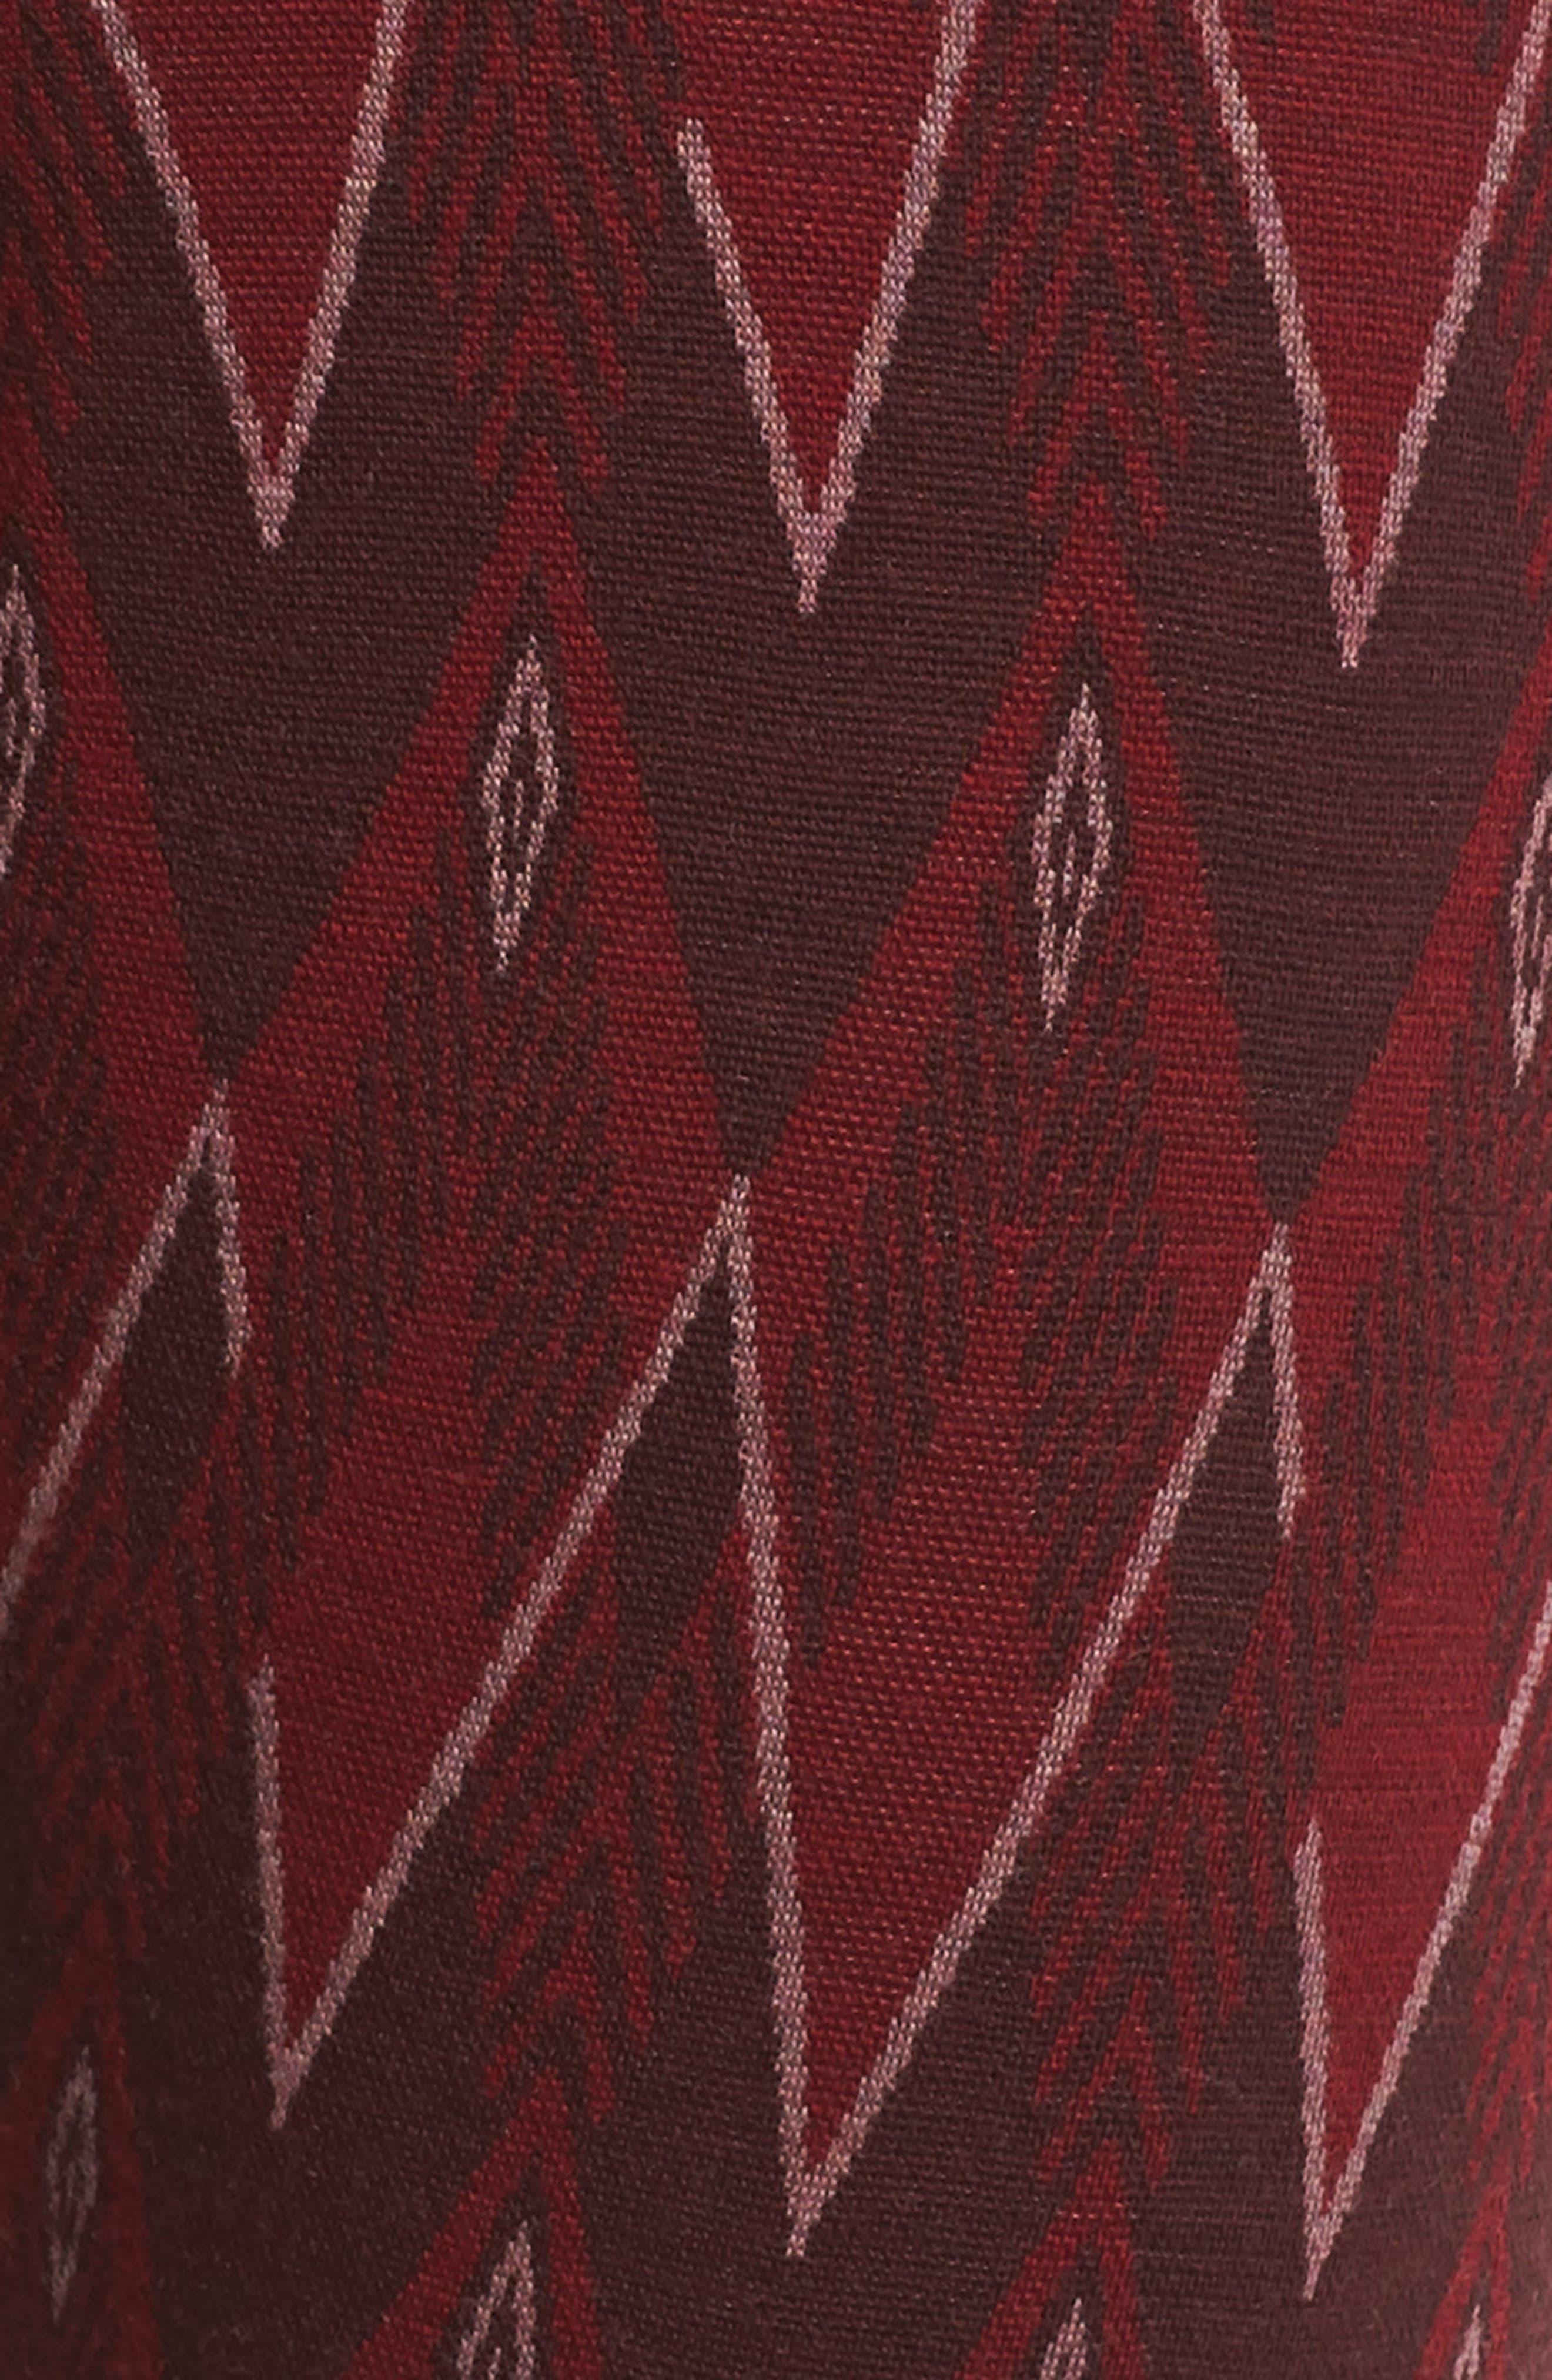 Merino 250 Base Layer Pattern Bottoms,                             Alternate thumbnail 6, color,                             610